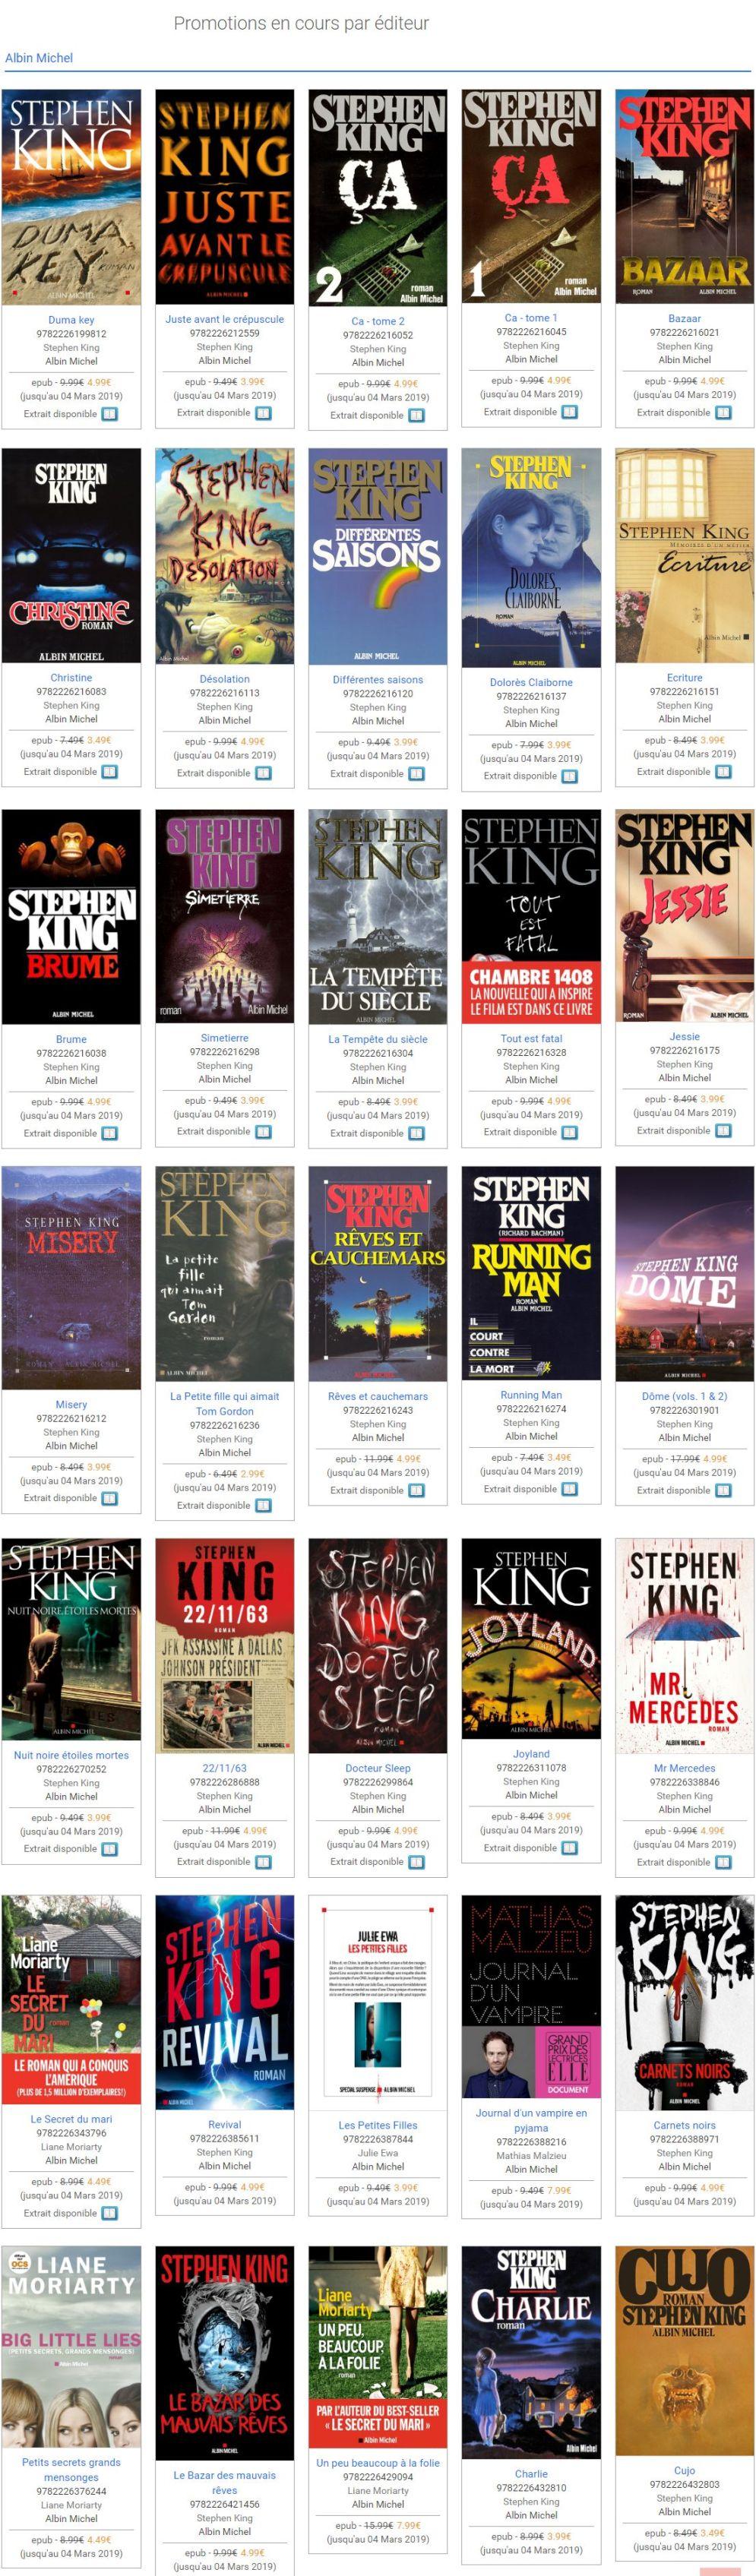 Stephenking Livres Ebooks Promotion Fevrier2019